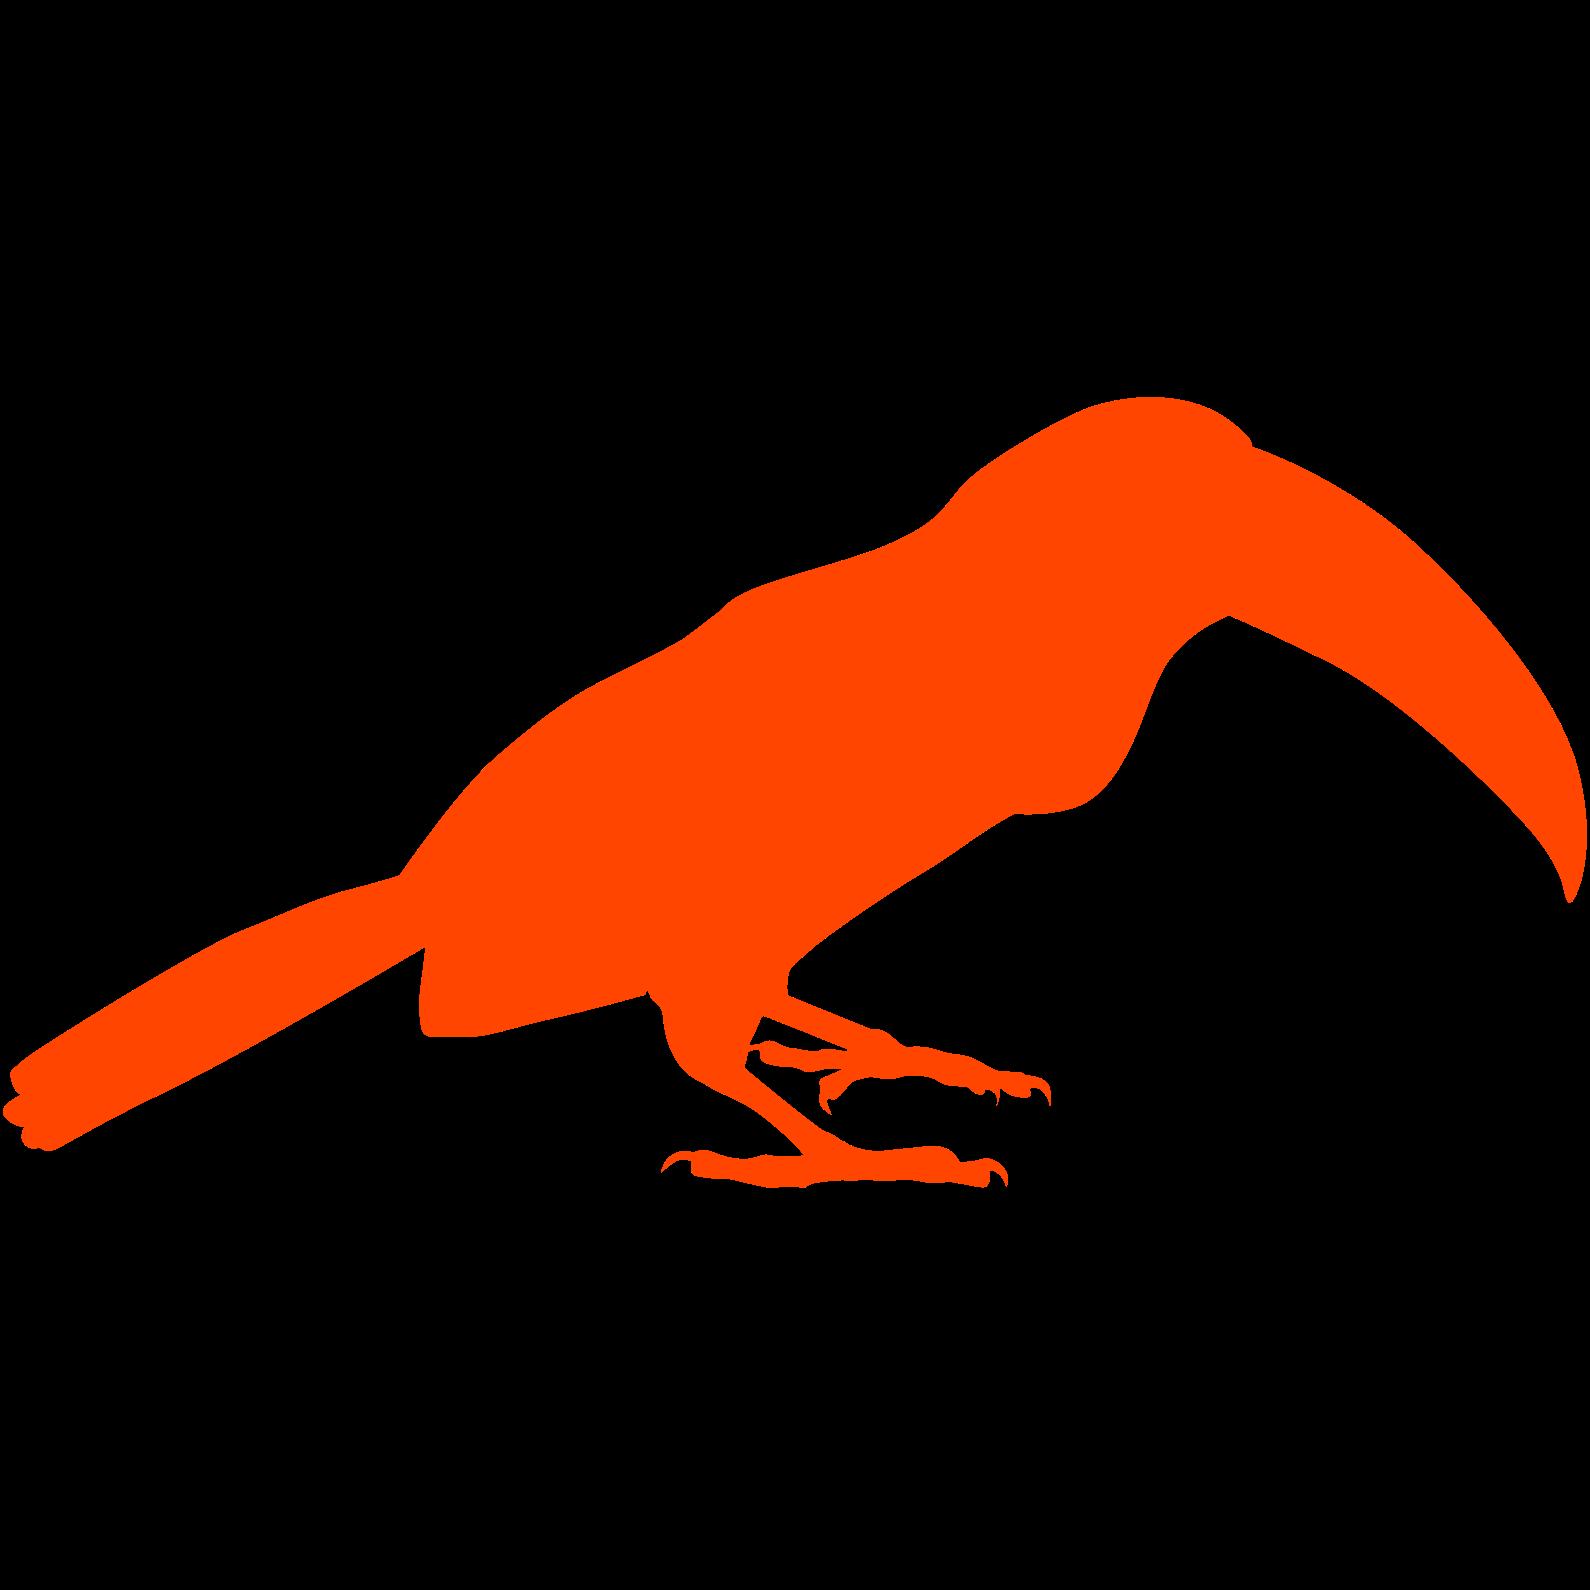 logo - Arjun Devarajan.png